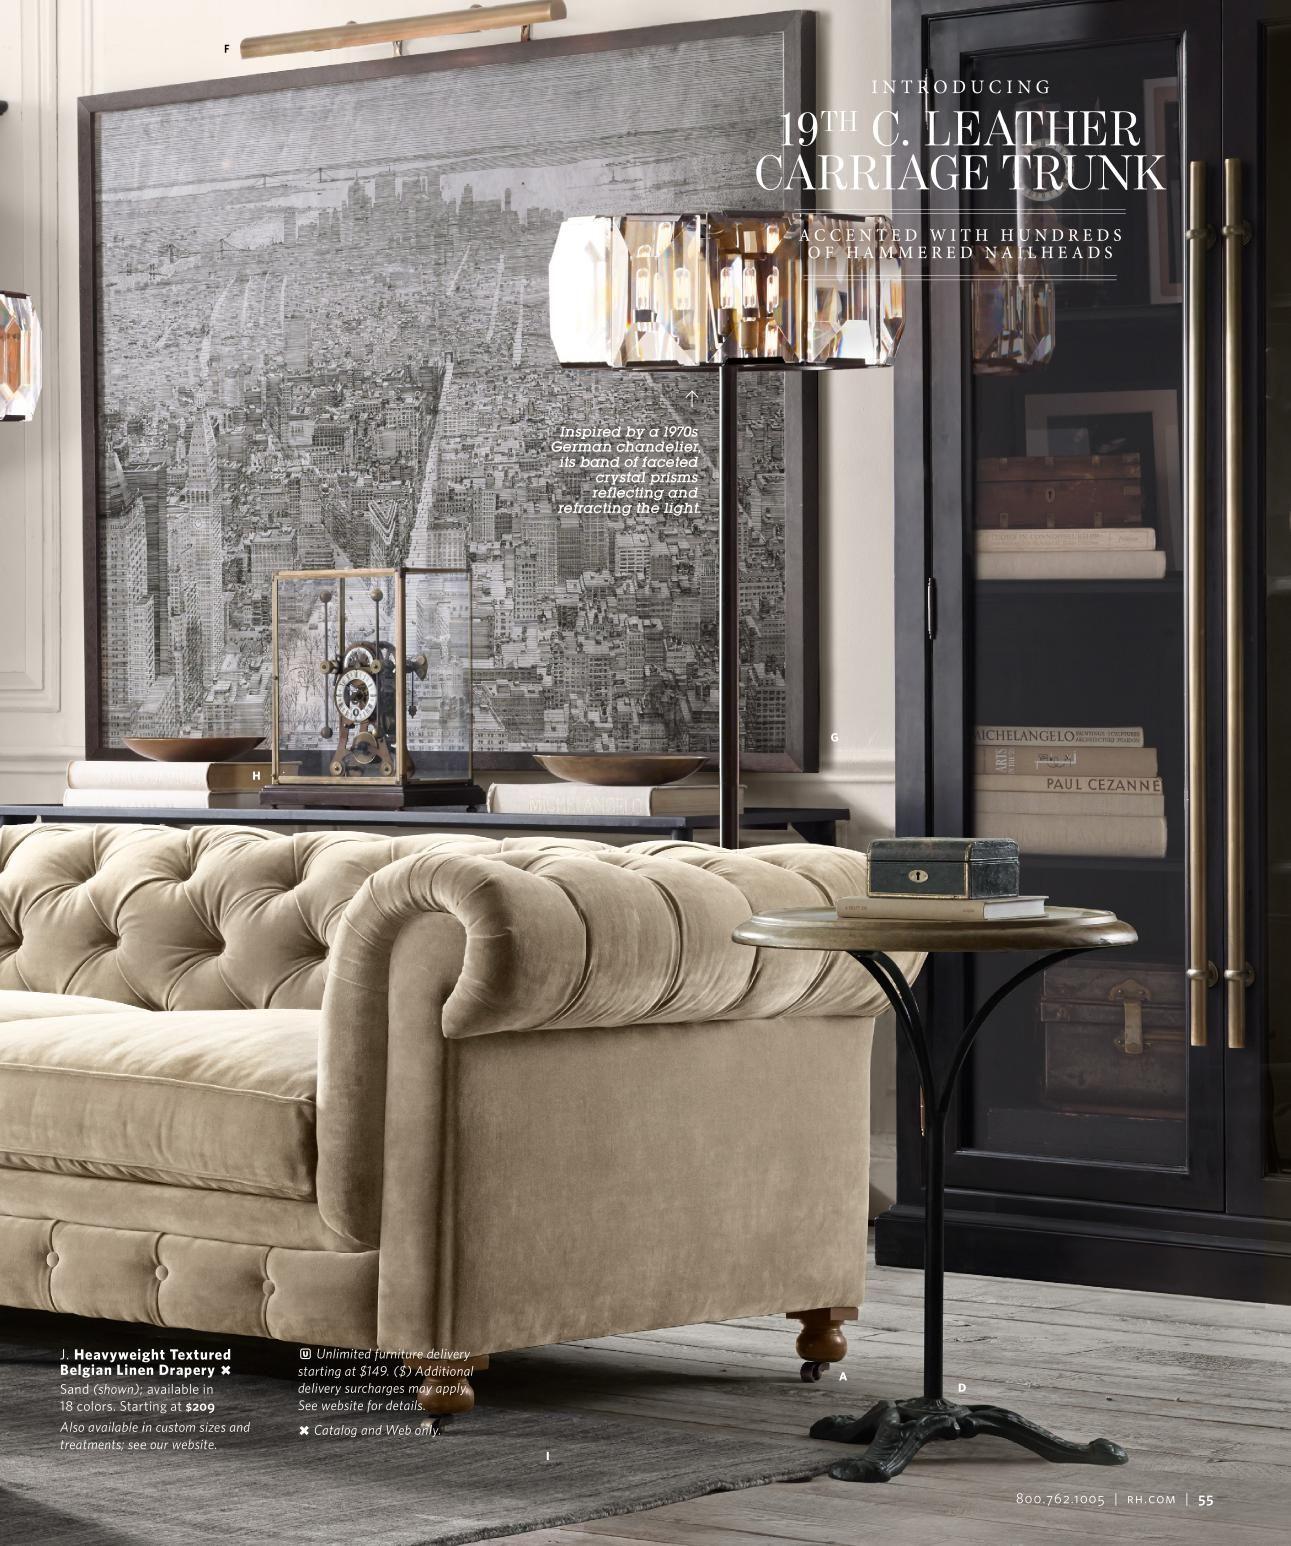 Rh source books living room decor in 2019 home decor - Restoration hardware living room ideas ...